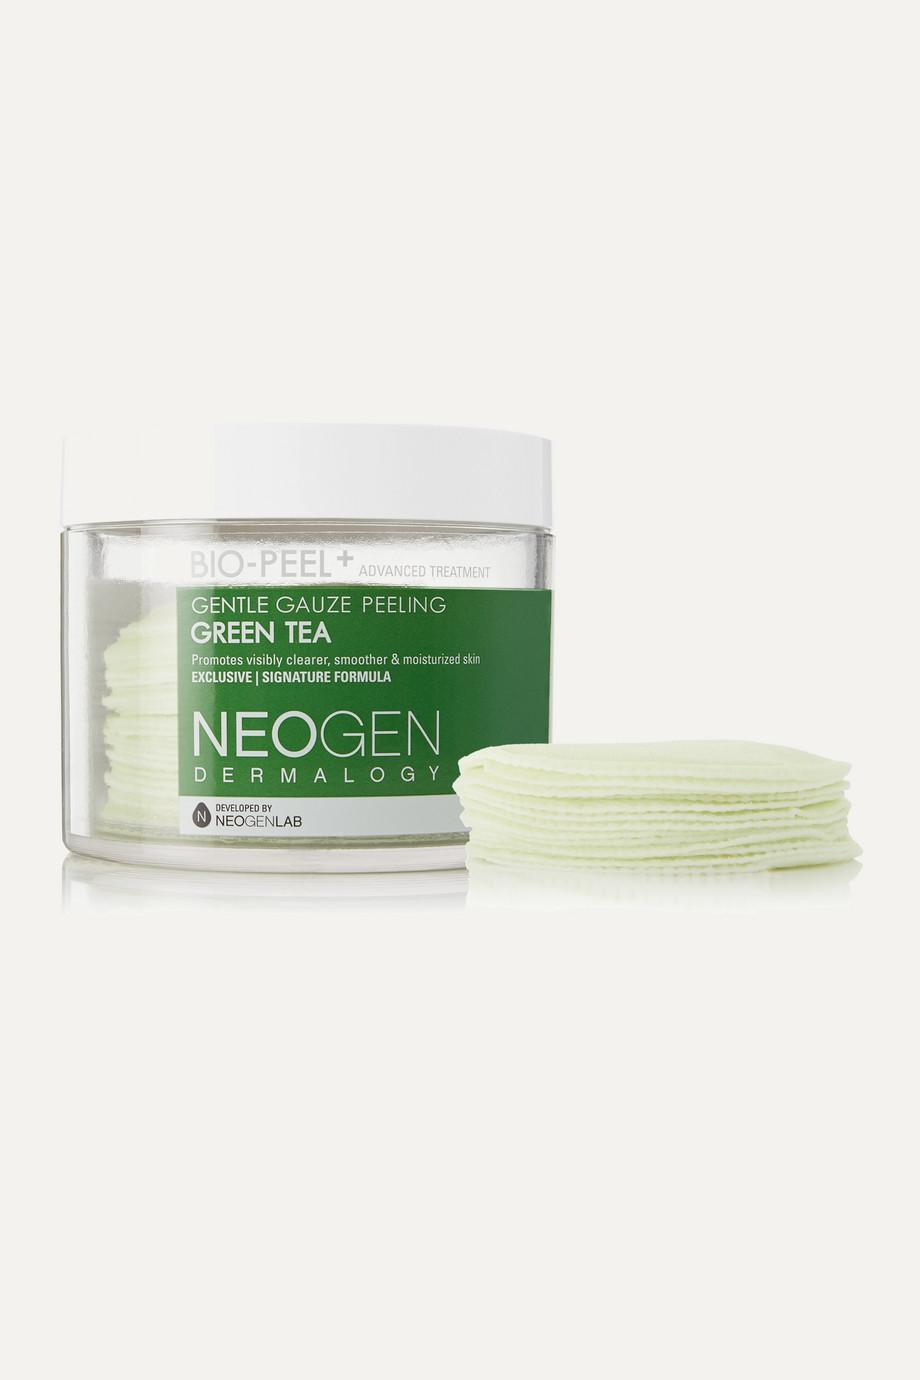 Neogen Dermalogy Bio-Peel Gentle Gauze Peeling - Green Tea, 30 pads